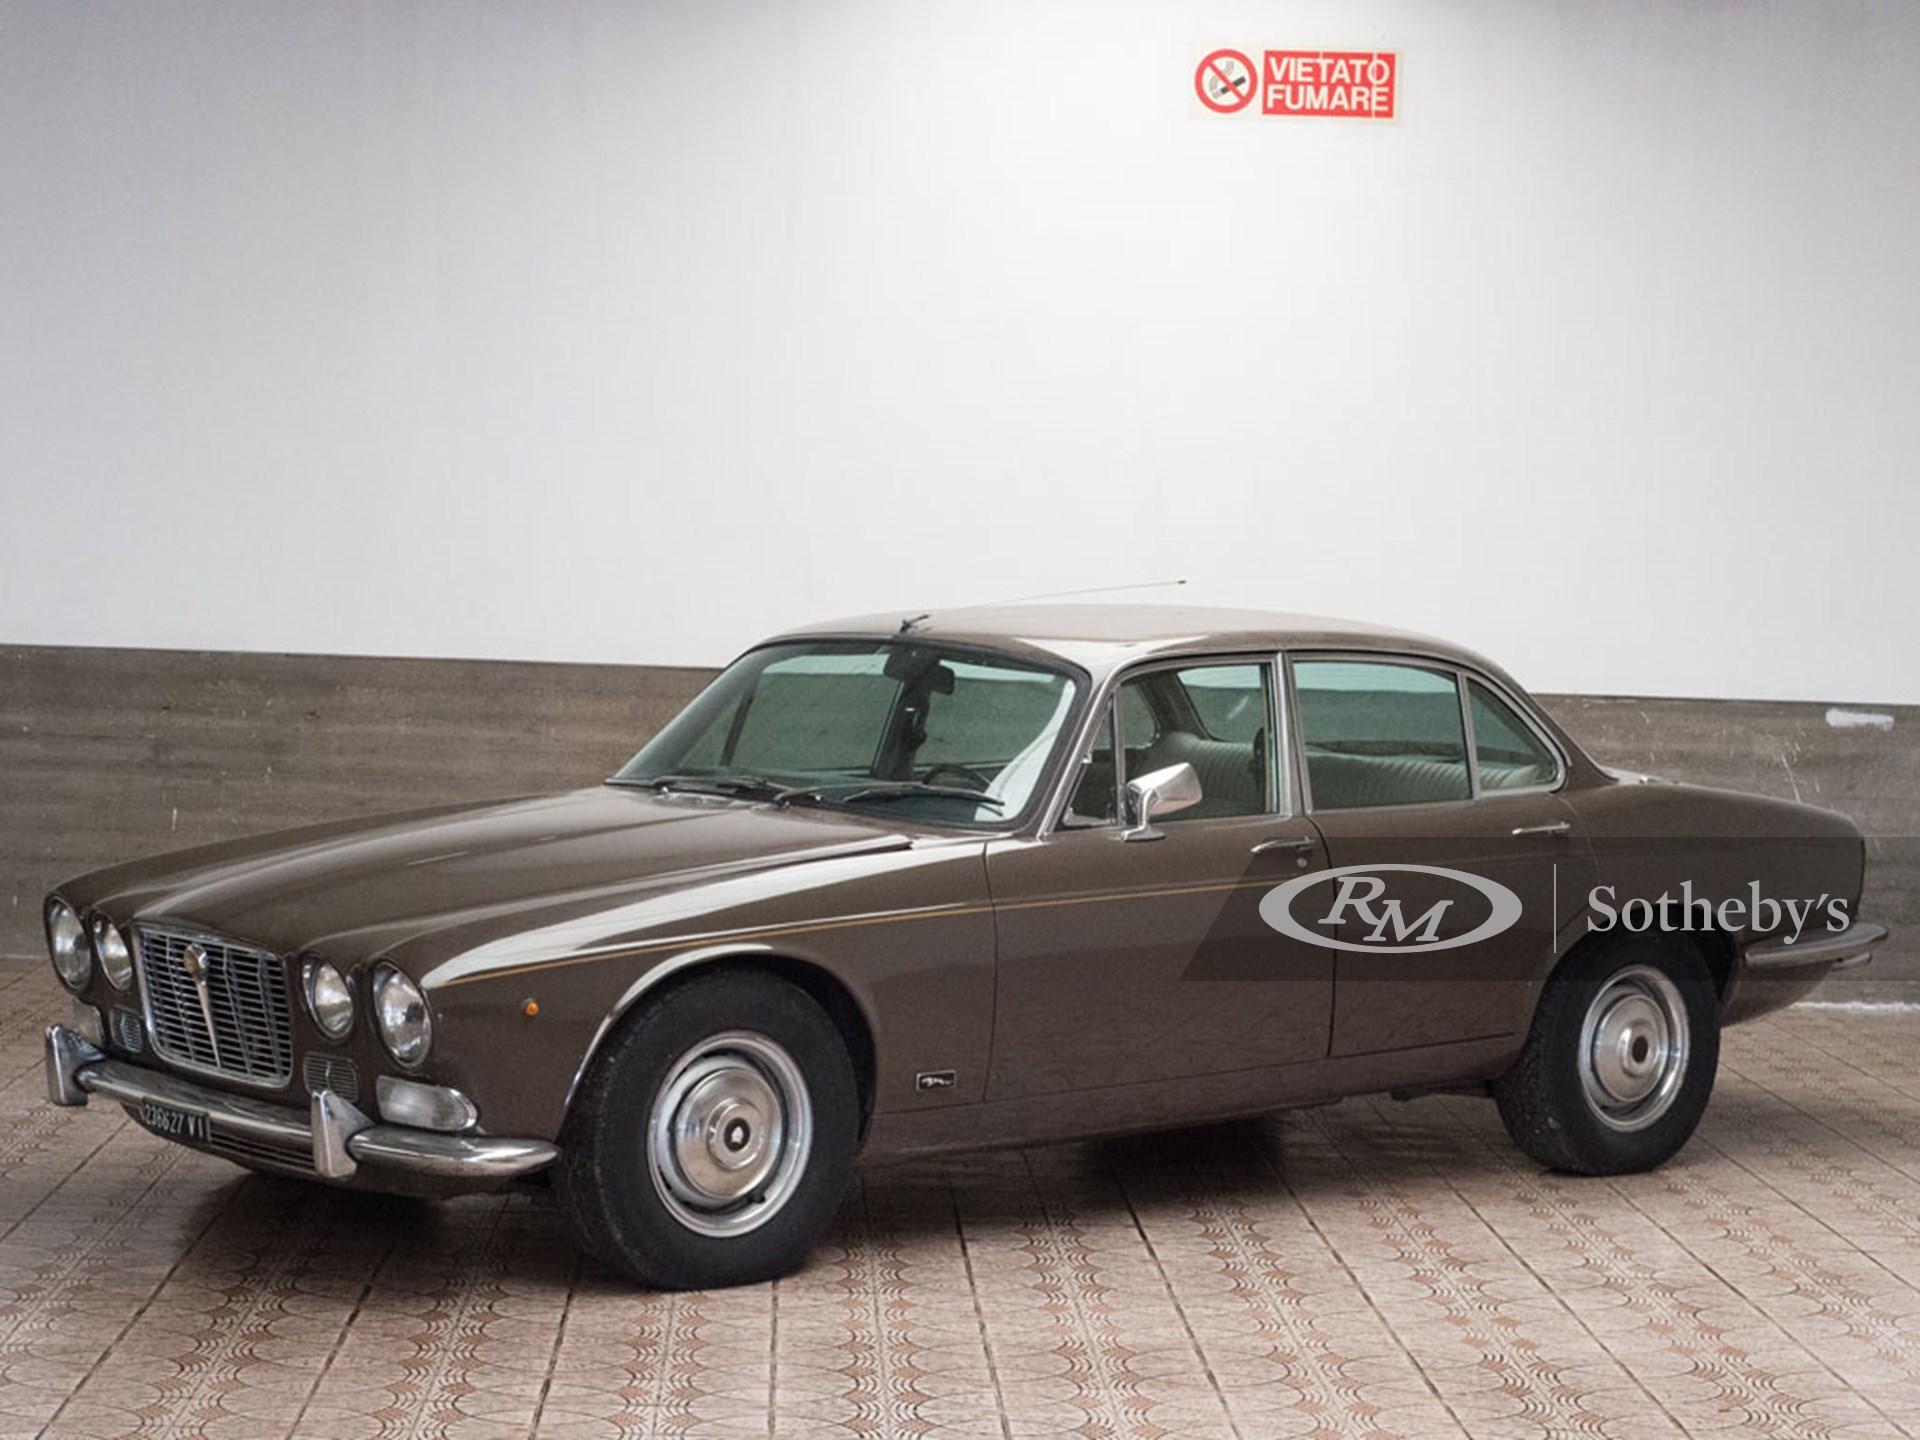 1971 Jaguar XJ6 4.2 SWB   Duemila Ruote 2016   RM Auctions